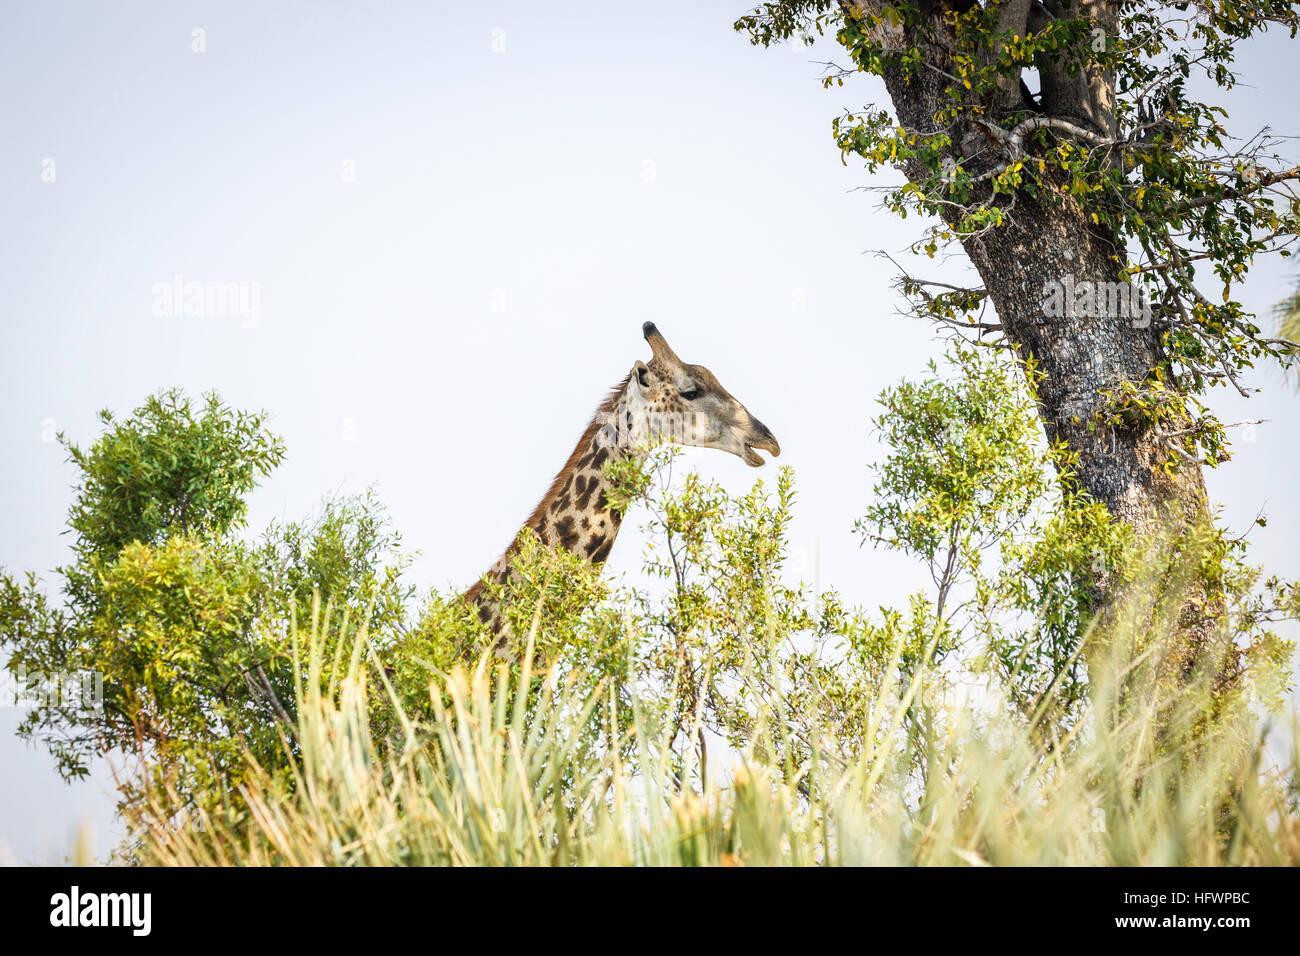 Chef du sud de Girafe (Giraffa camelopardalis), Sandibe Camp, à côté de la Moremi, Okavango Delta, Kalahari, Botswana, Afrique du Sud Banque D'Images